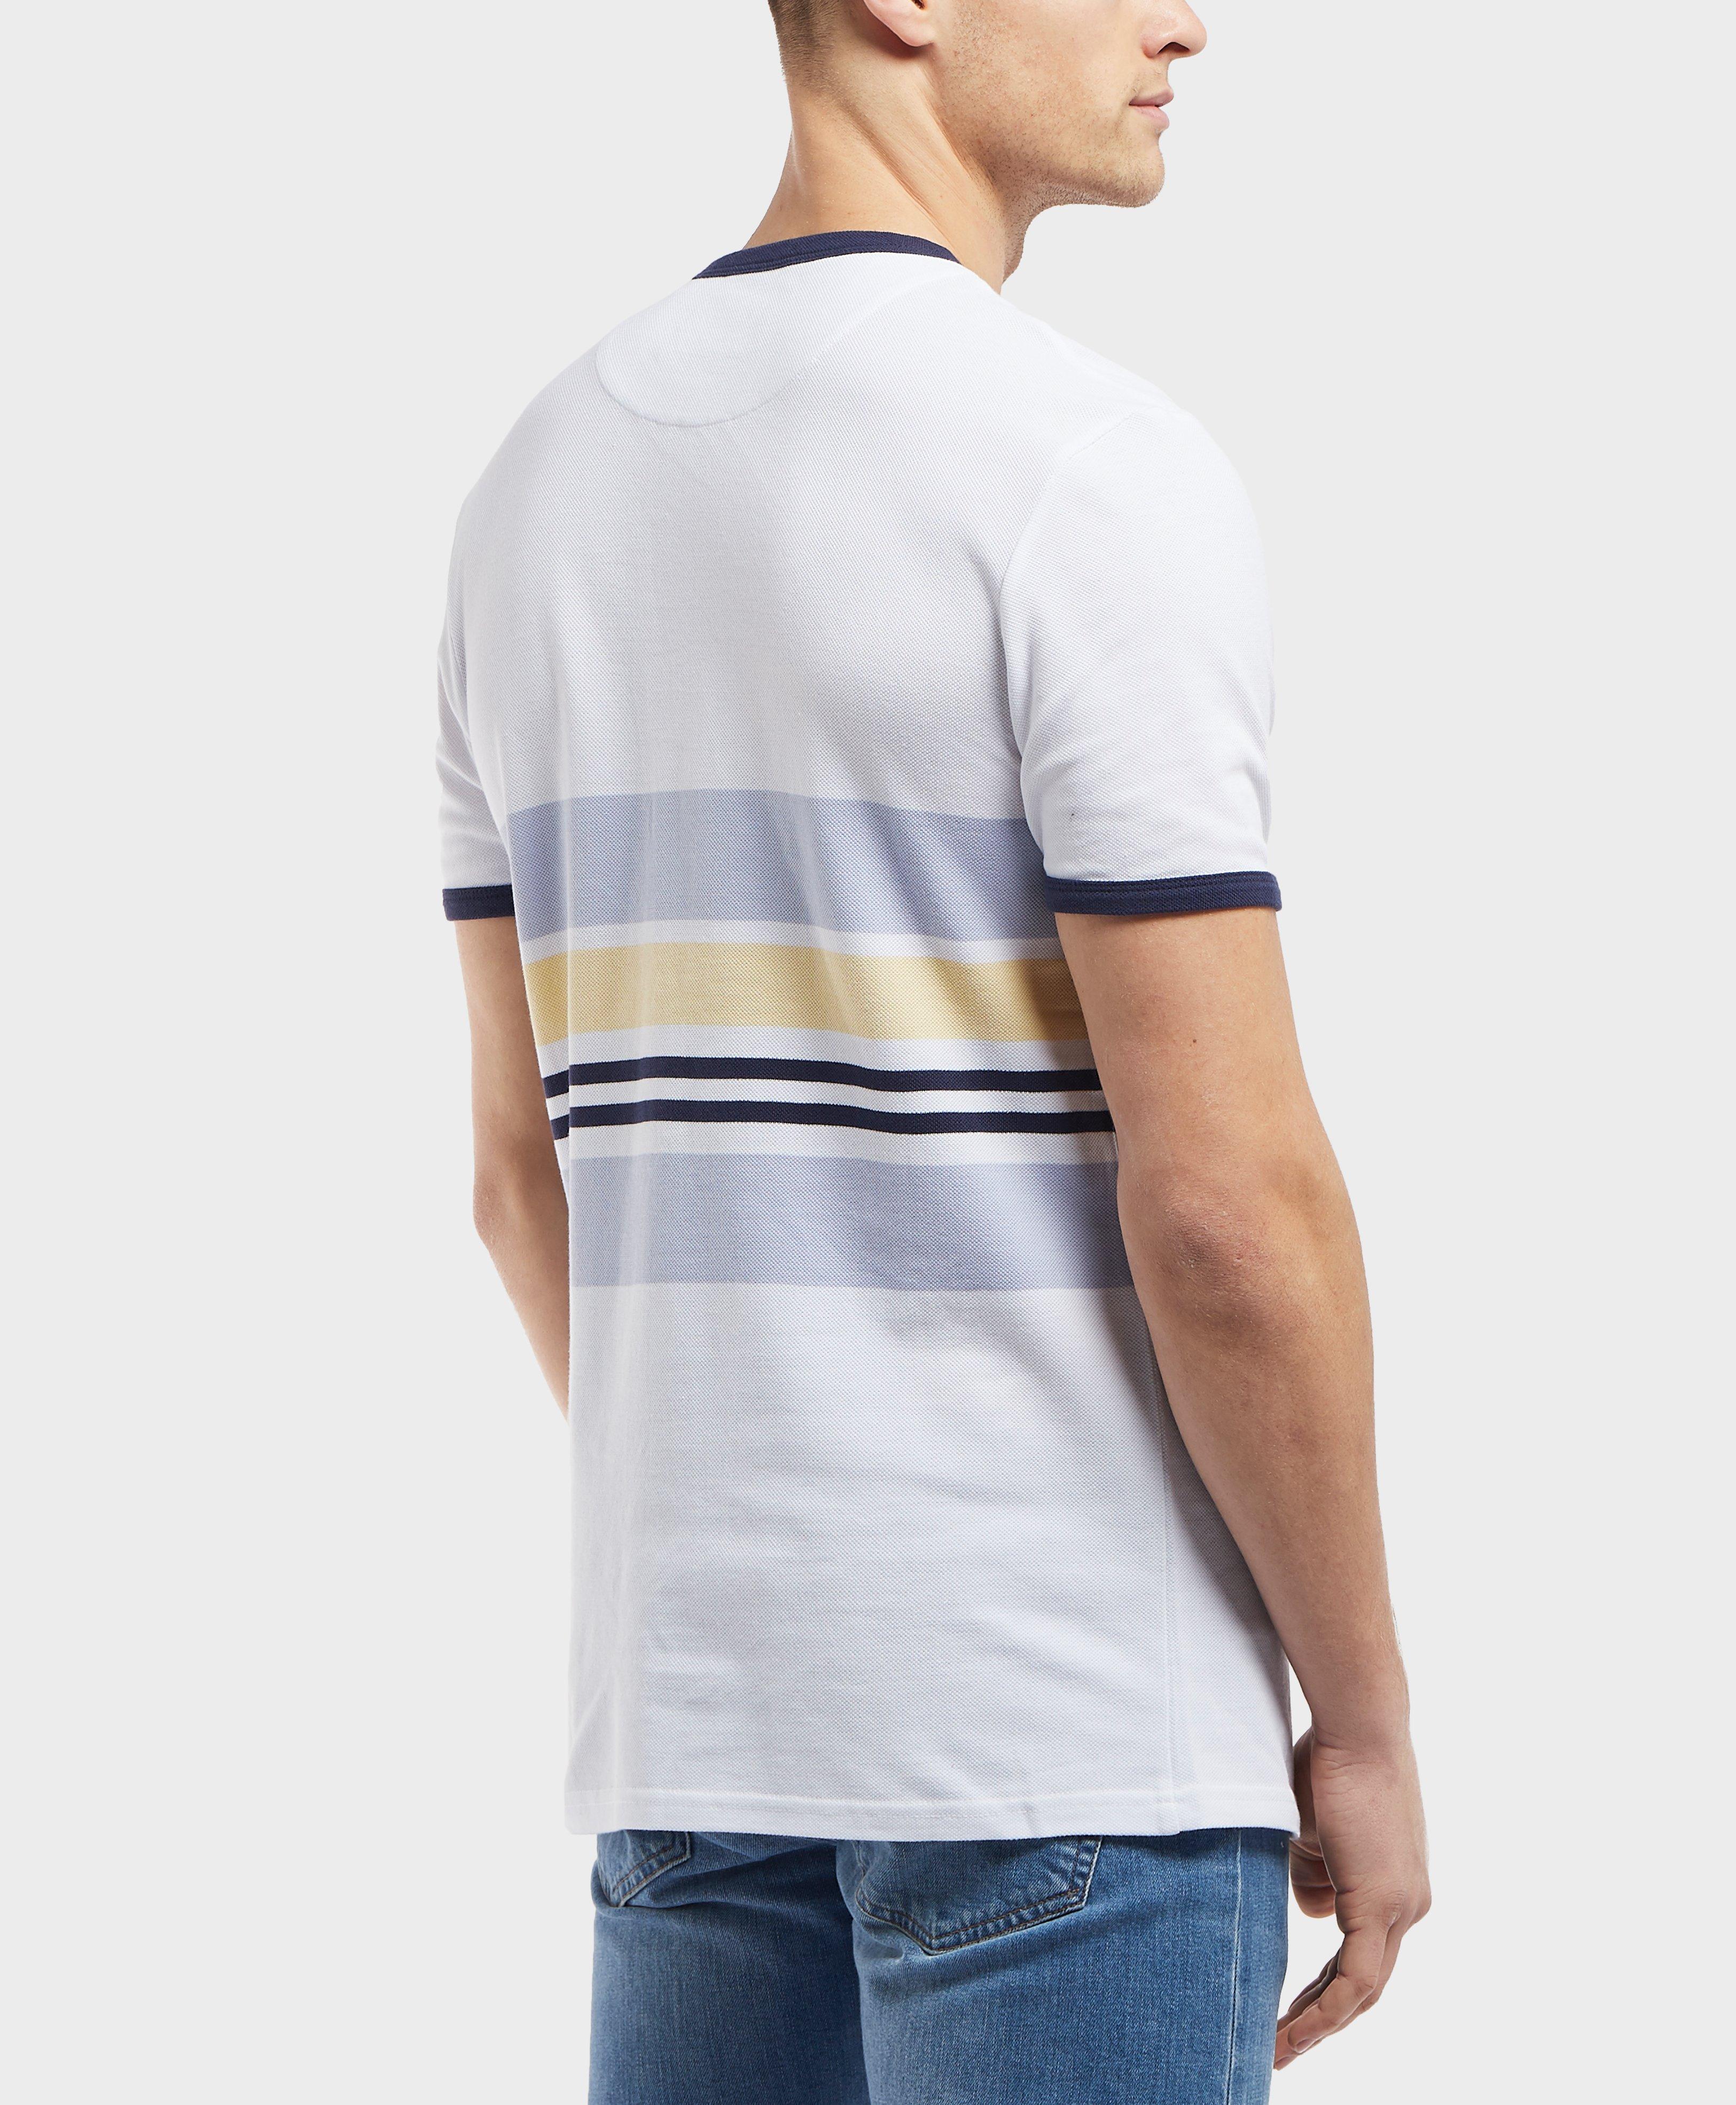 4b7fb6267 Lyst - Lyle & Scott Pique Short Sleeve Stripe T-shirt for Men